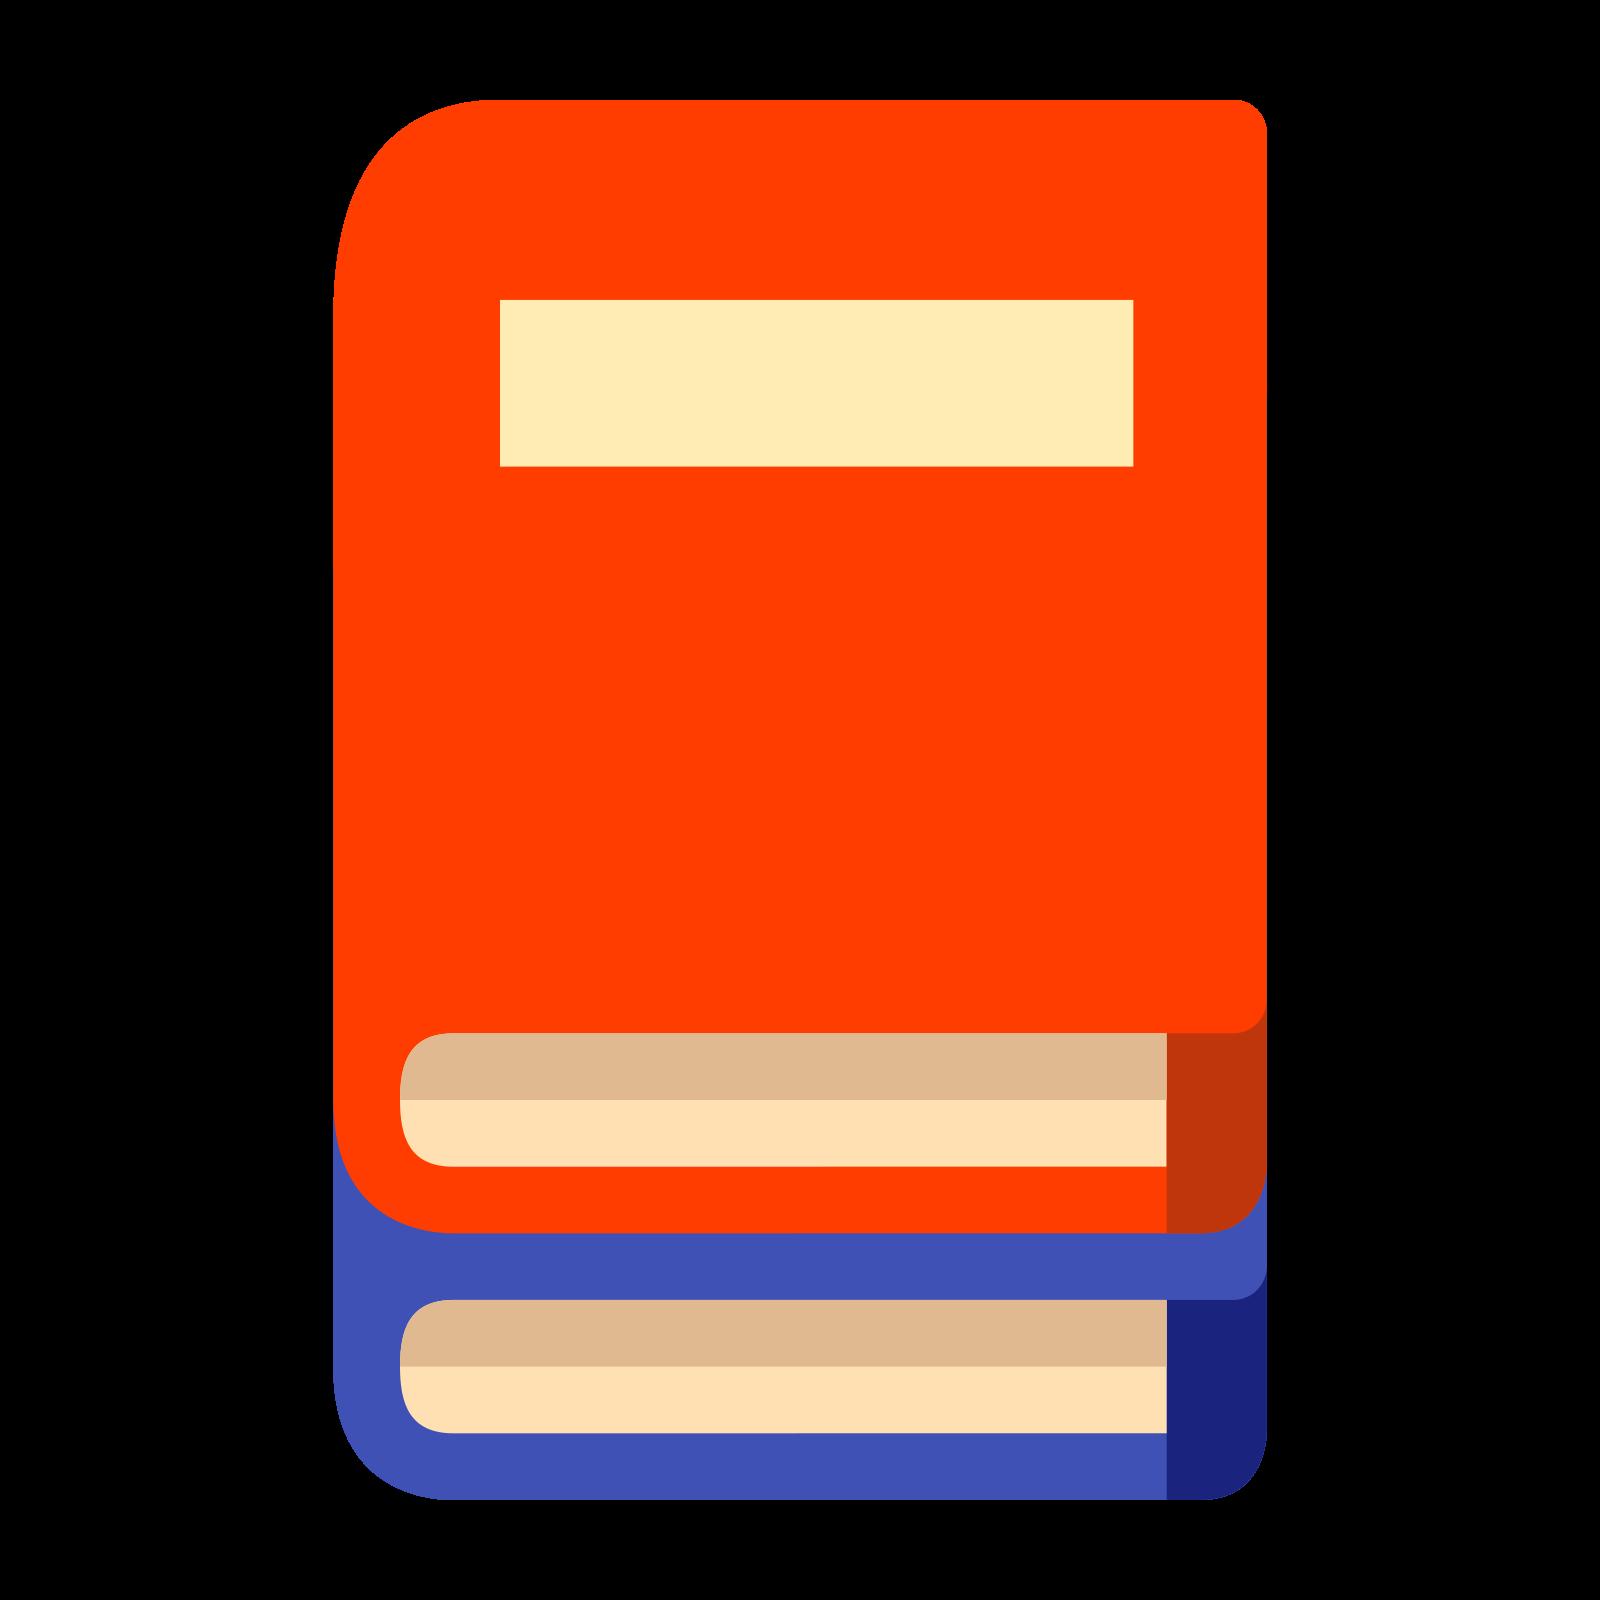 Stos książek icon